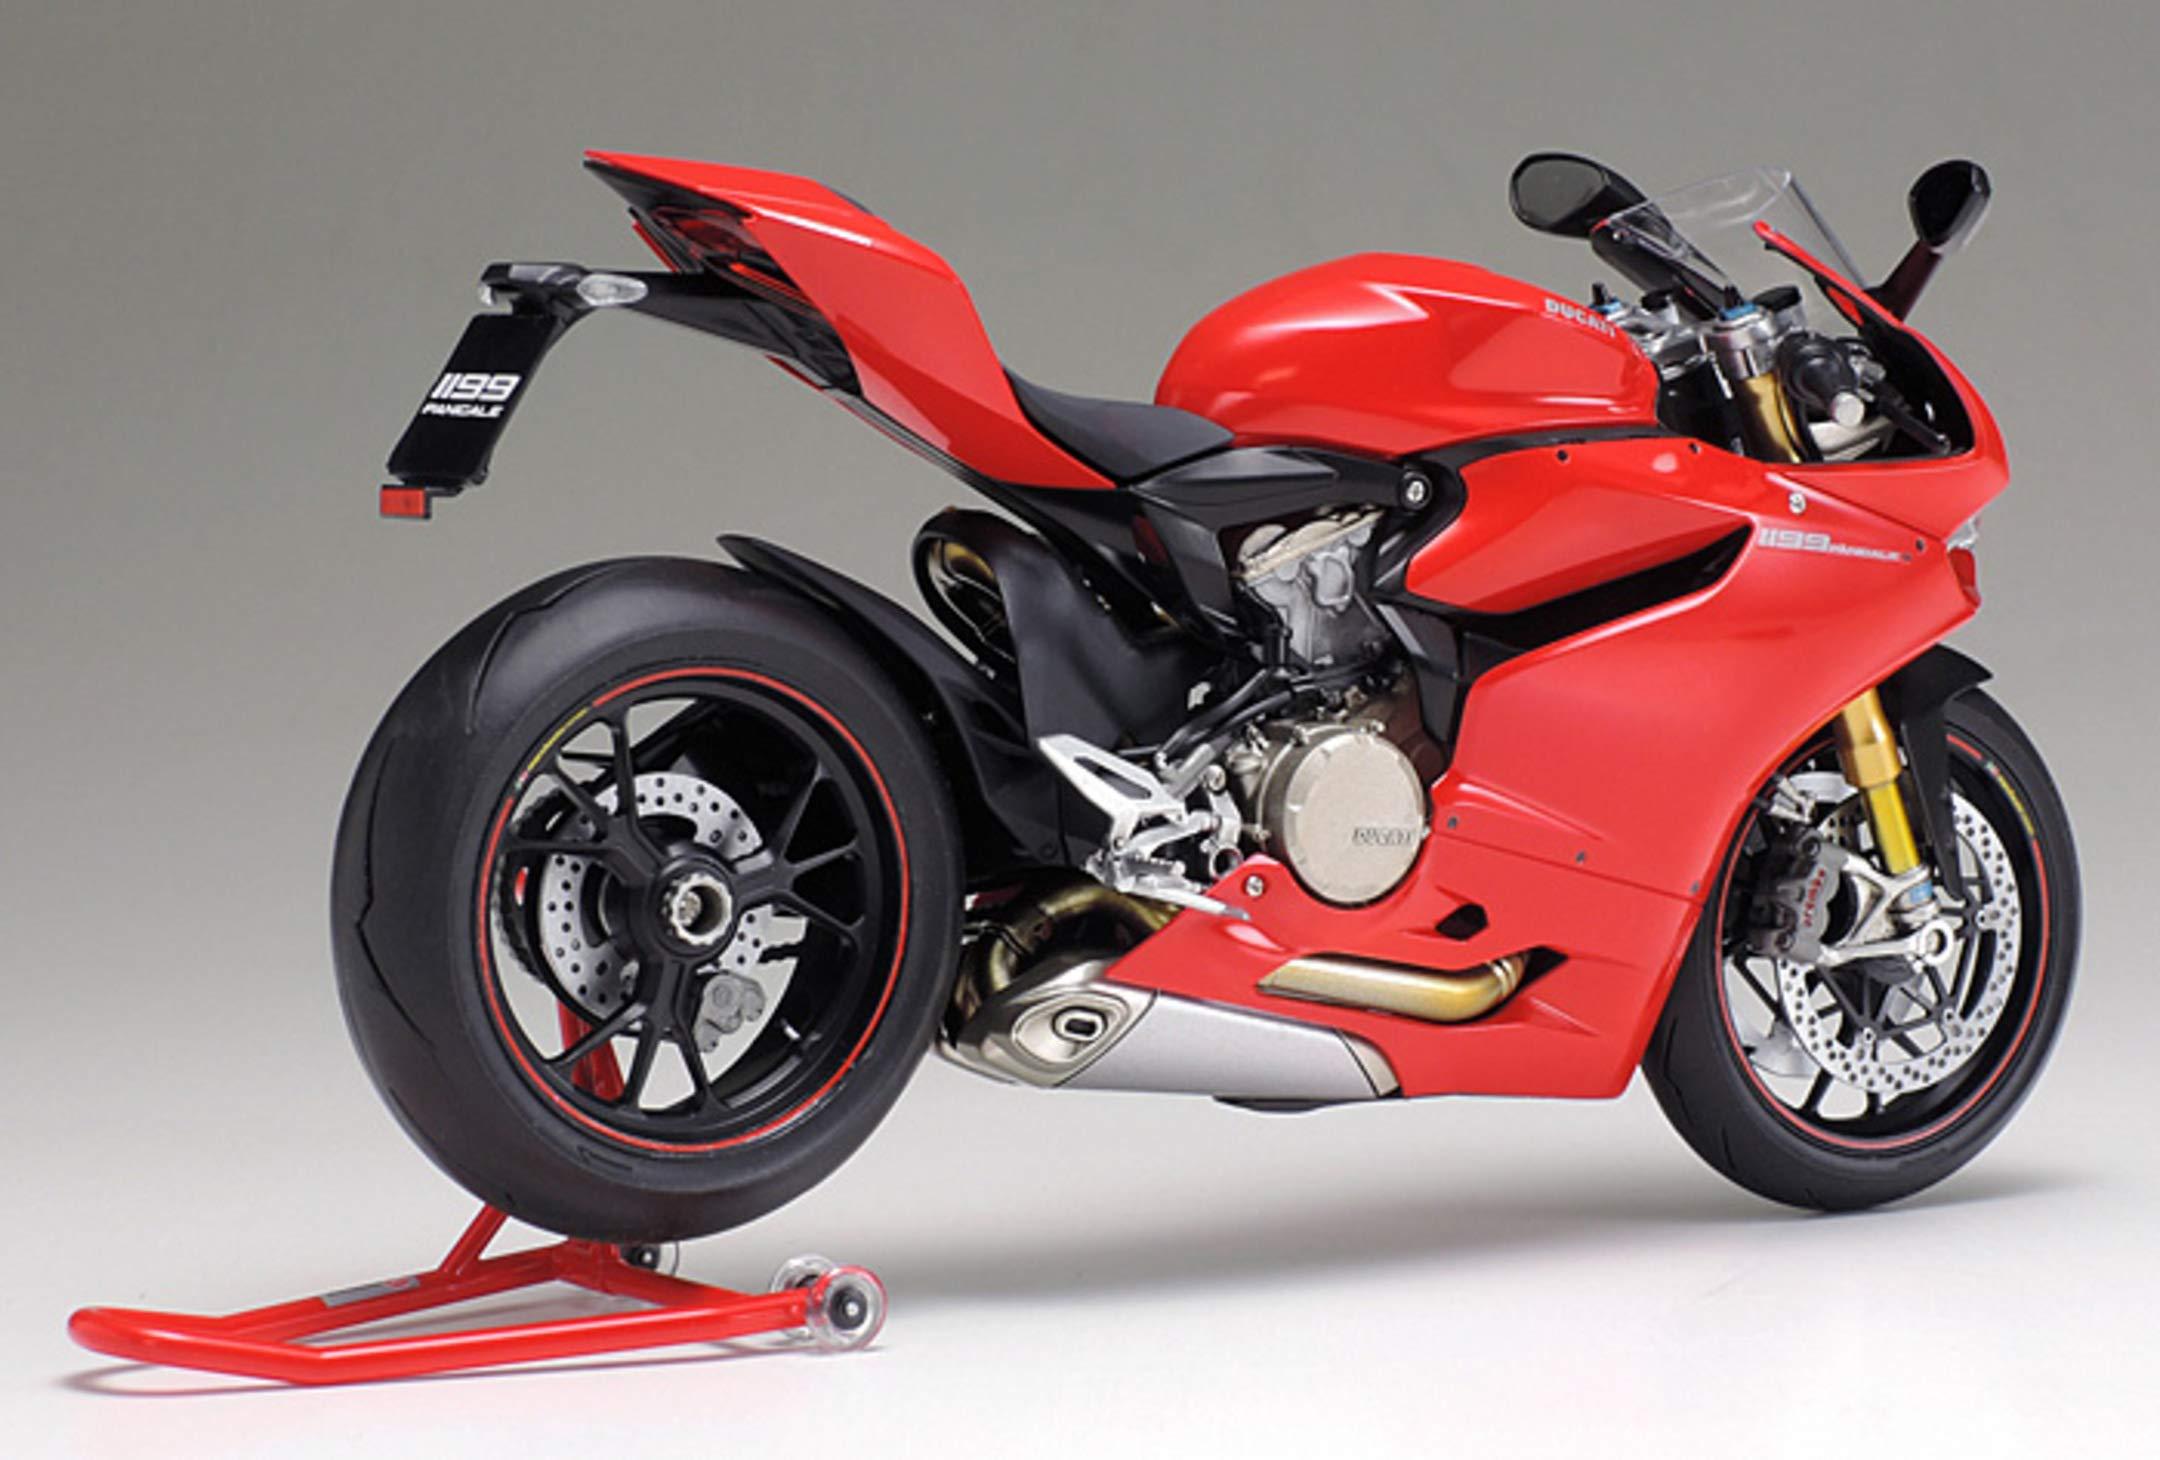 Tamiya 14129 1:12 Ducati 1199 Panigale S Model 6